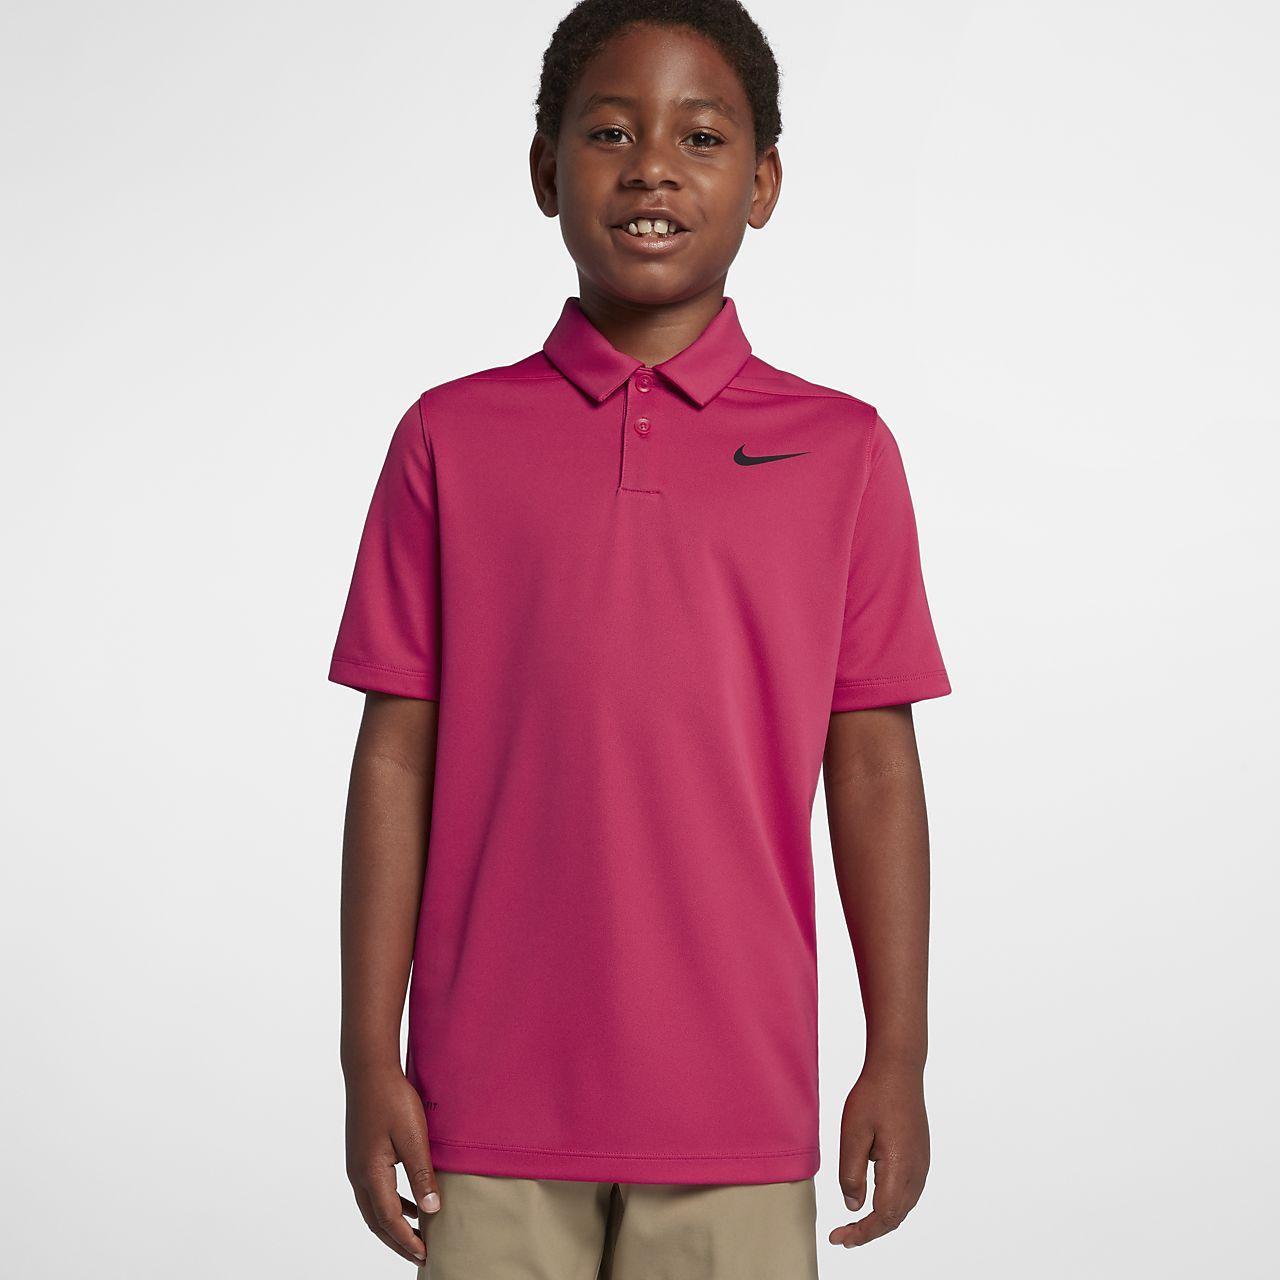 Golfpikétröja Nike Dri-FIT Victory för ungdom (killar)